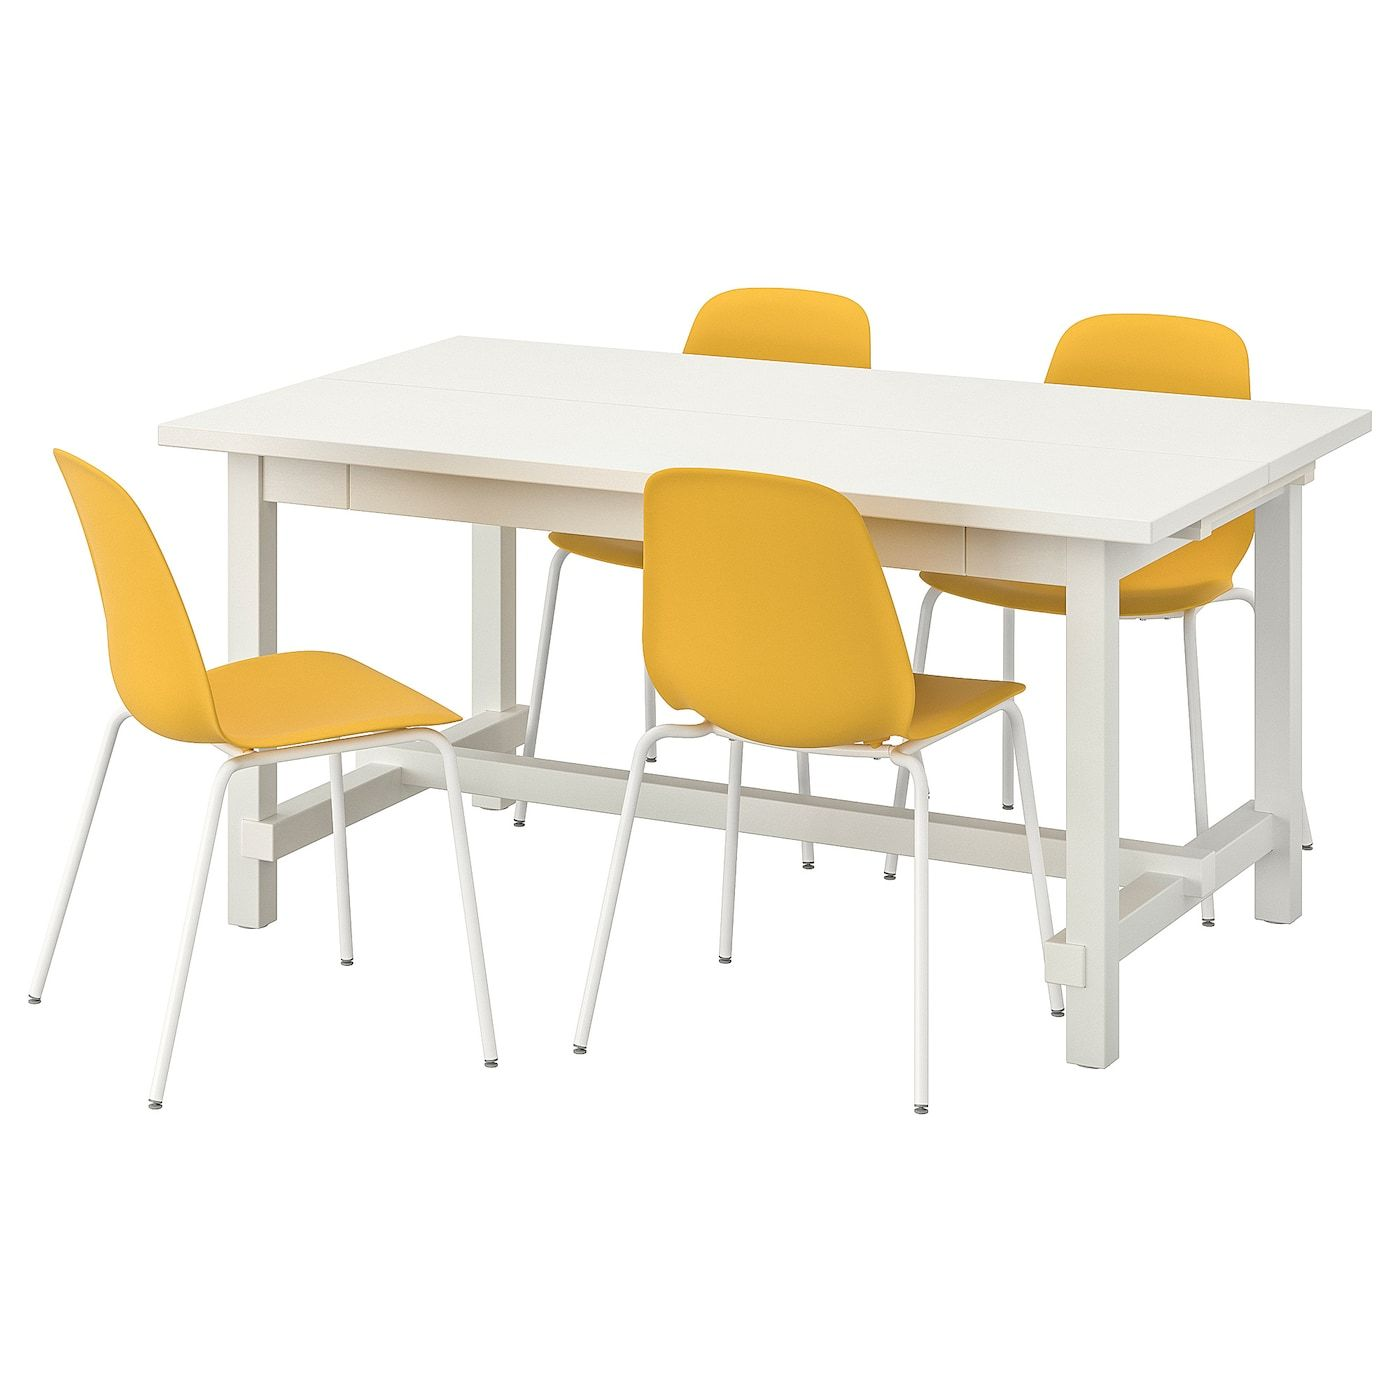 Ikea Tv Meubel Grenen.Ikea Nordviken Leifarne Table And 4 Chairs